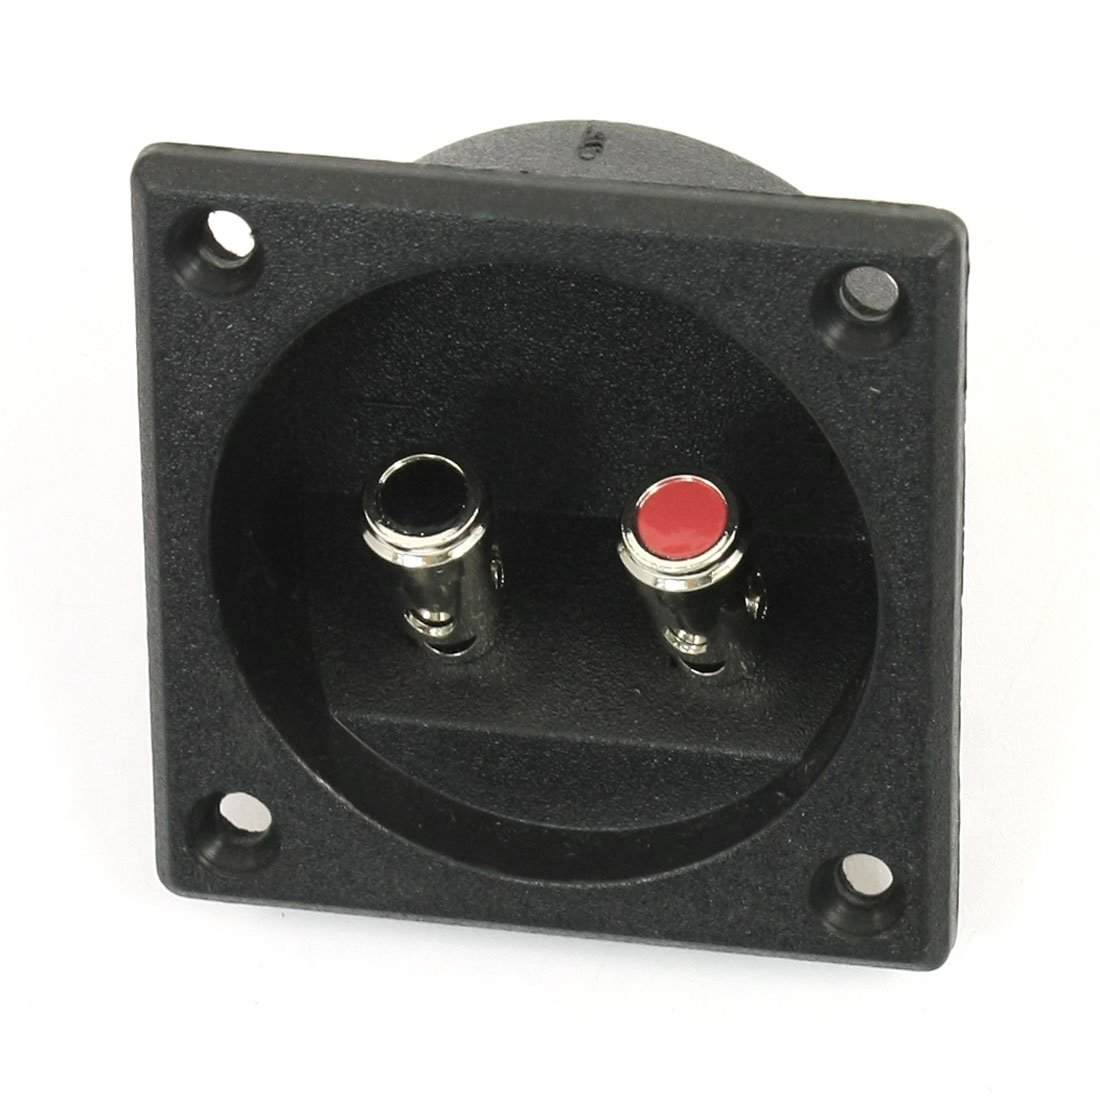 IMC Hot Square Shape Double Binding Post Type Speaker Box Terminal Cup Black